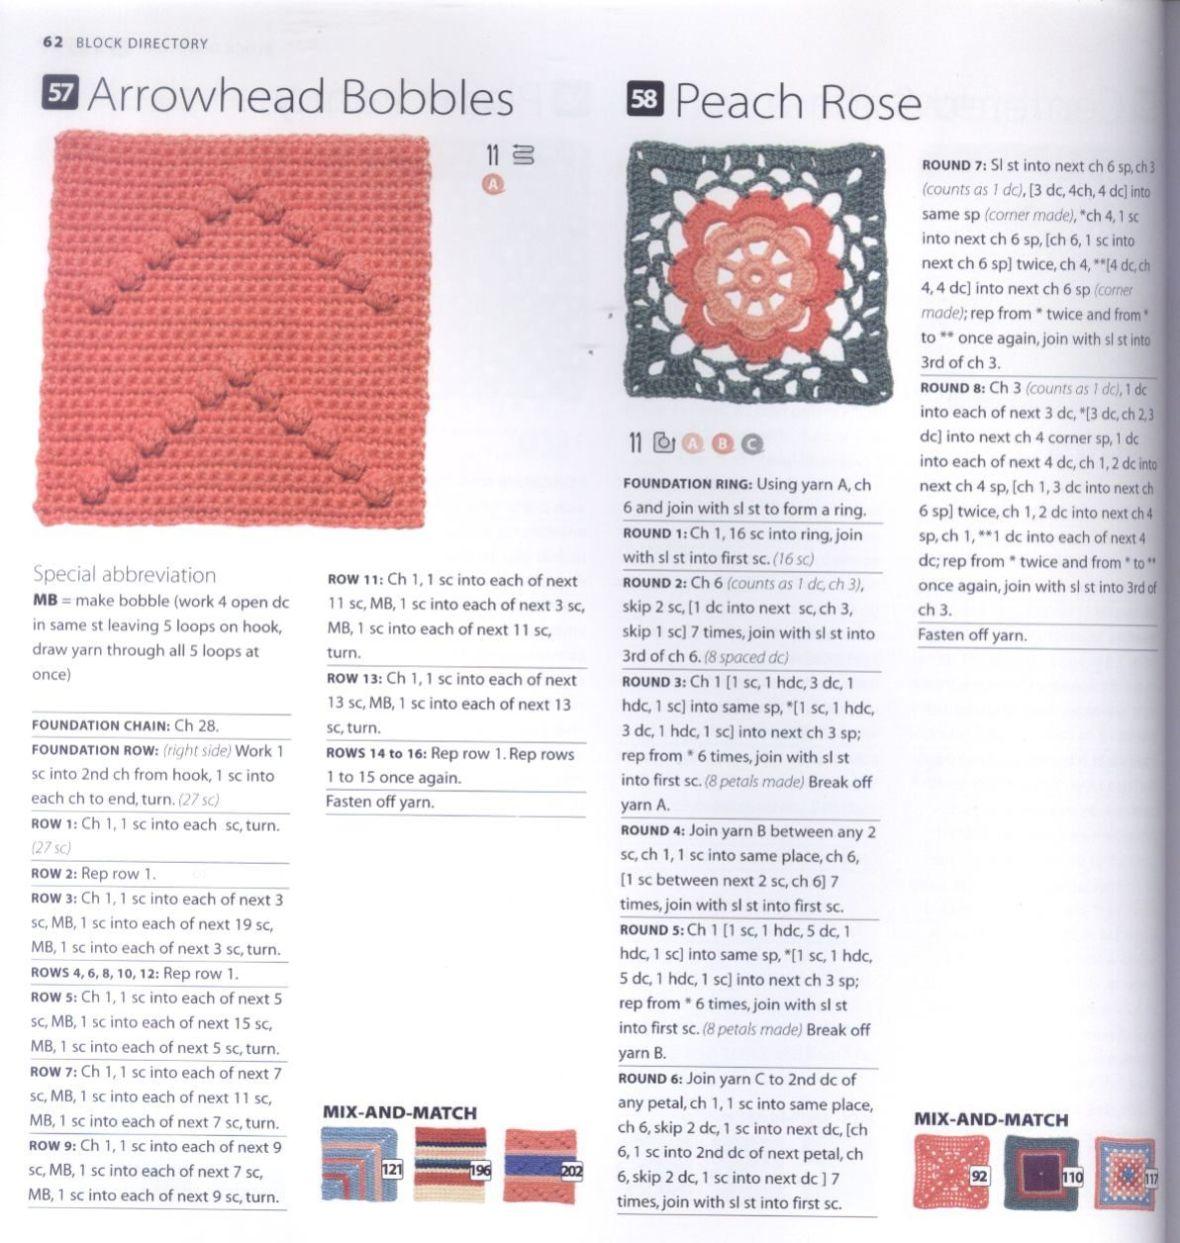 200 Crocheted Blocks for blankets, throws & Afghans 062